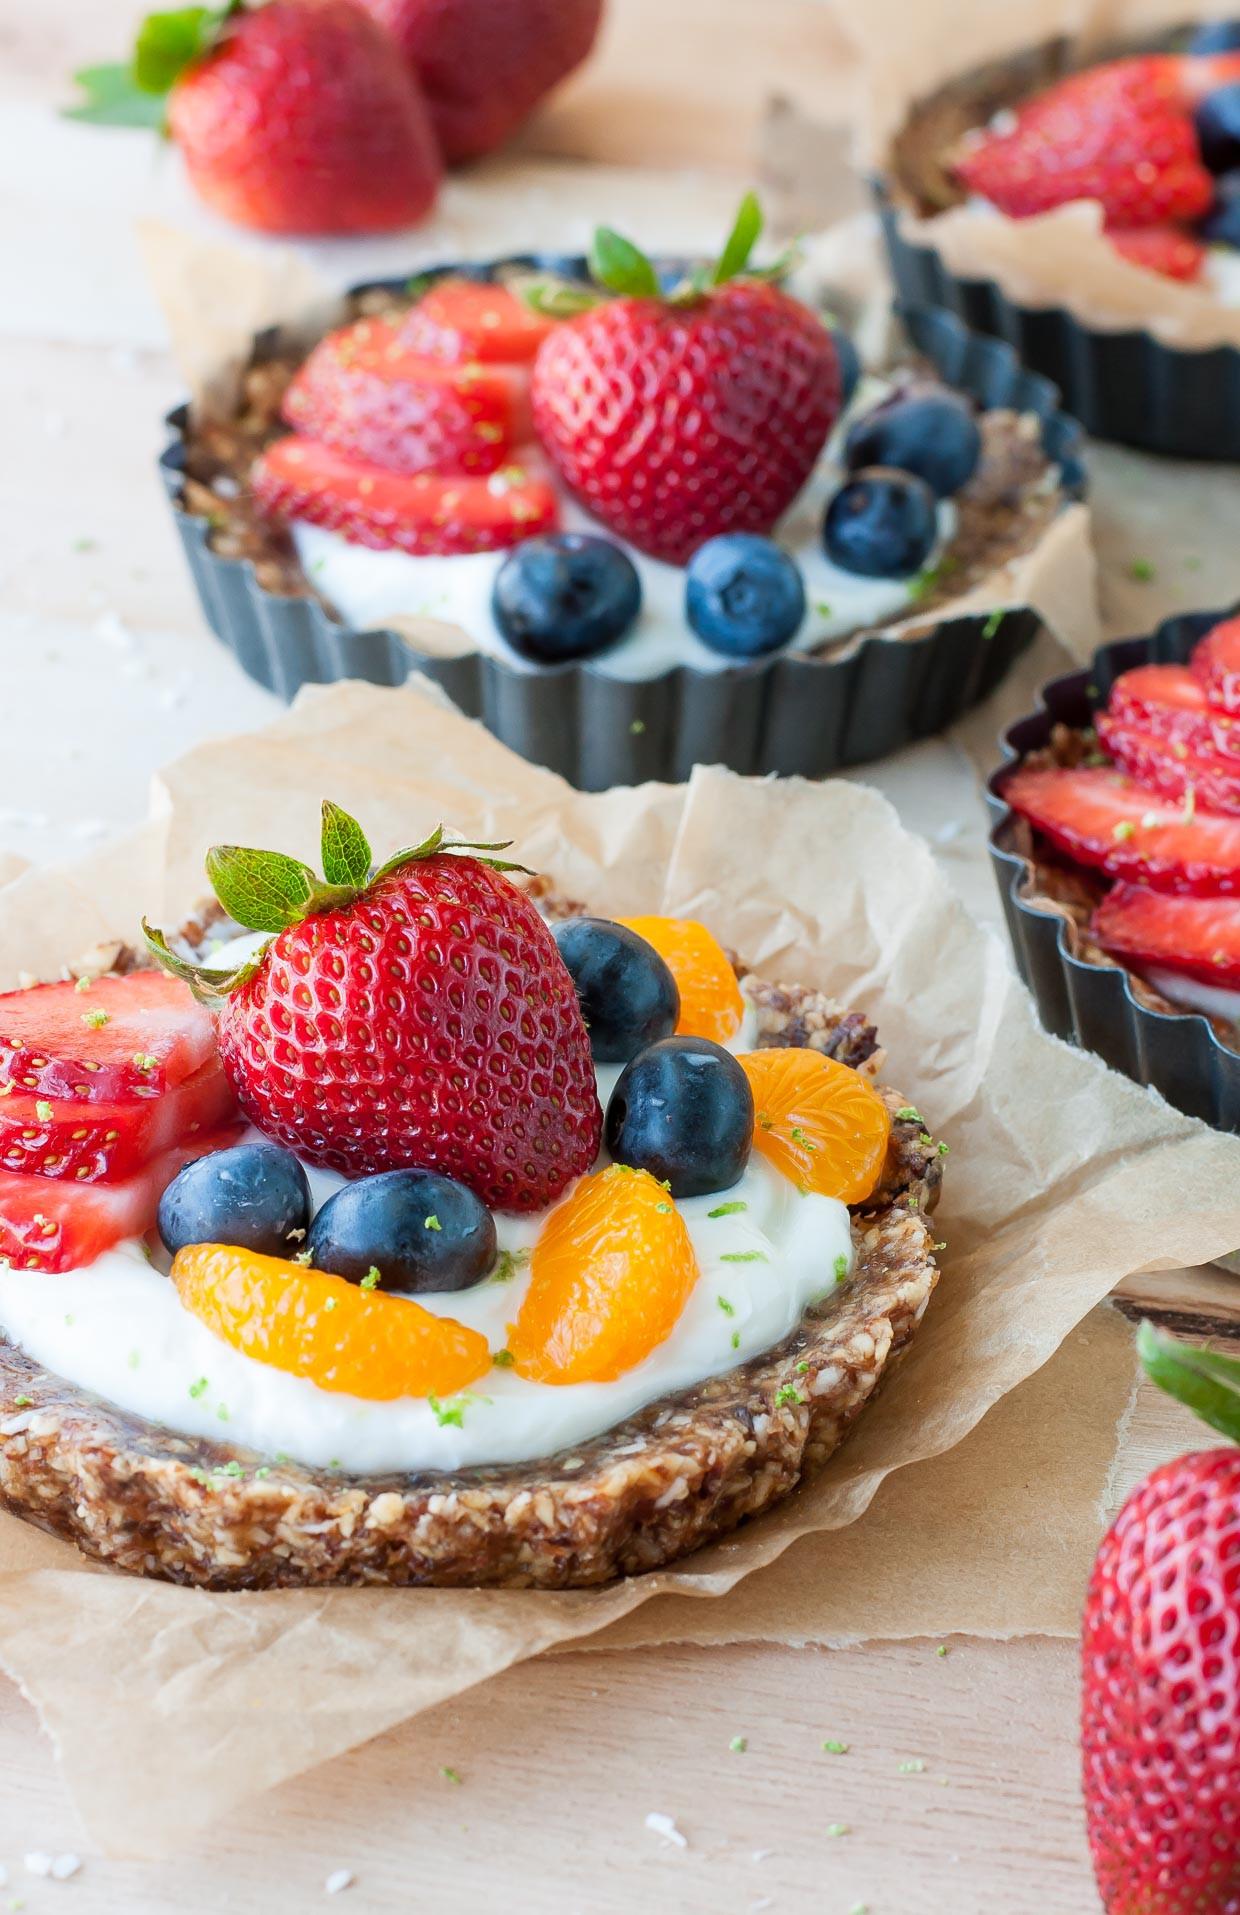 Healthy Fruit Desserts  Healthy No Bake Coconut Lime Fruit and Yogurt Tarts Peas